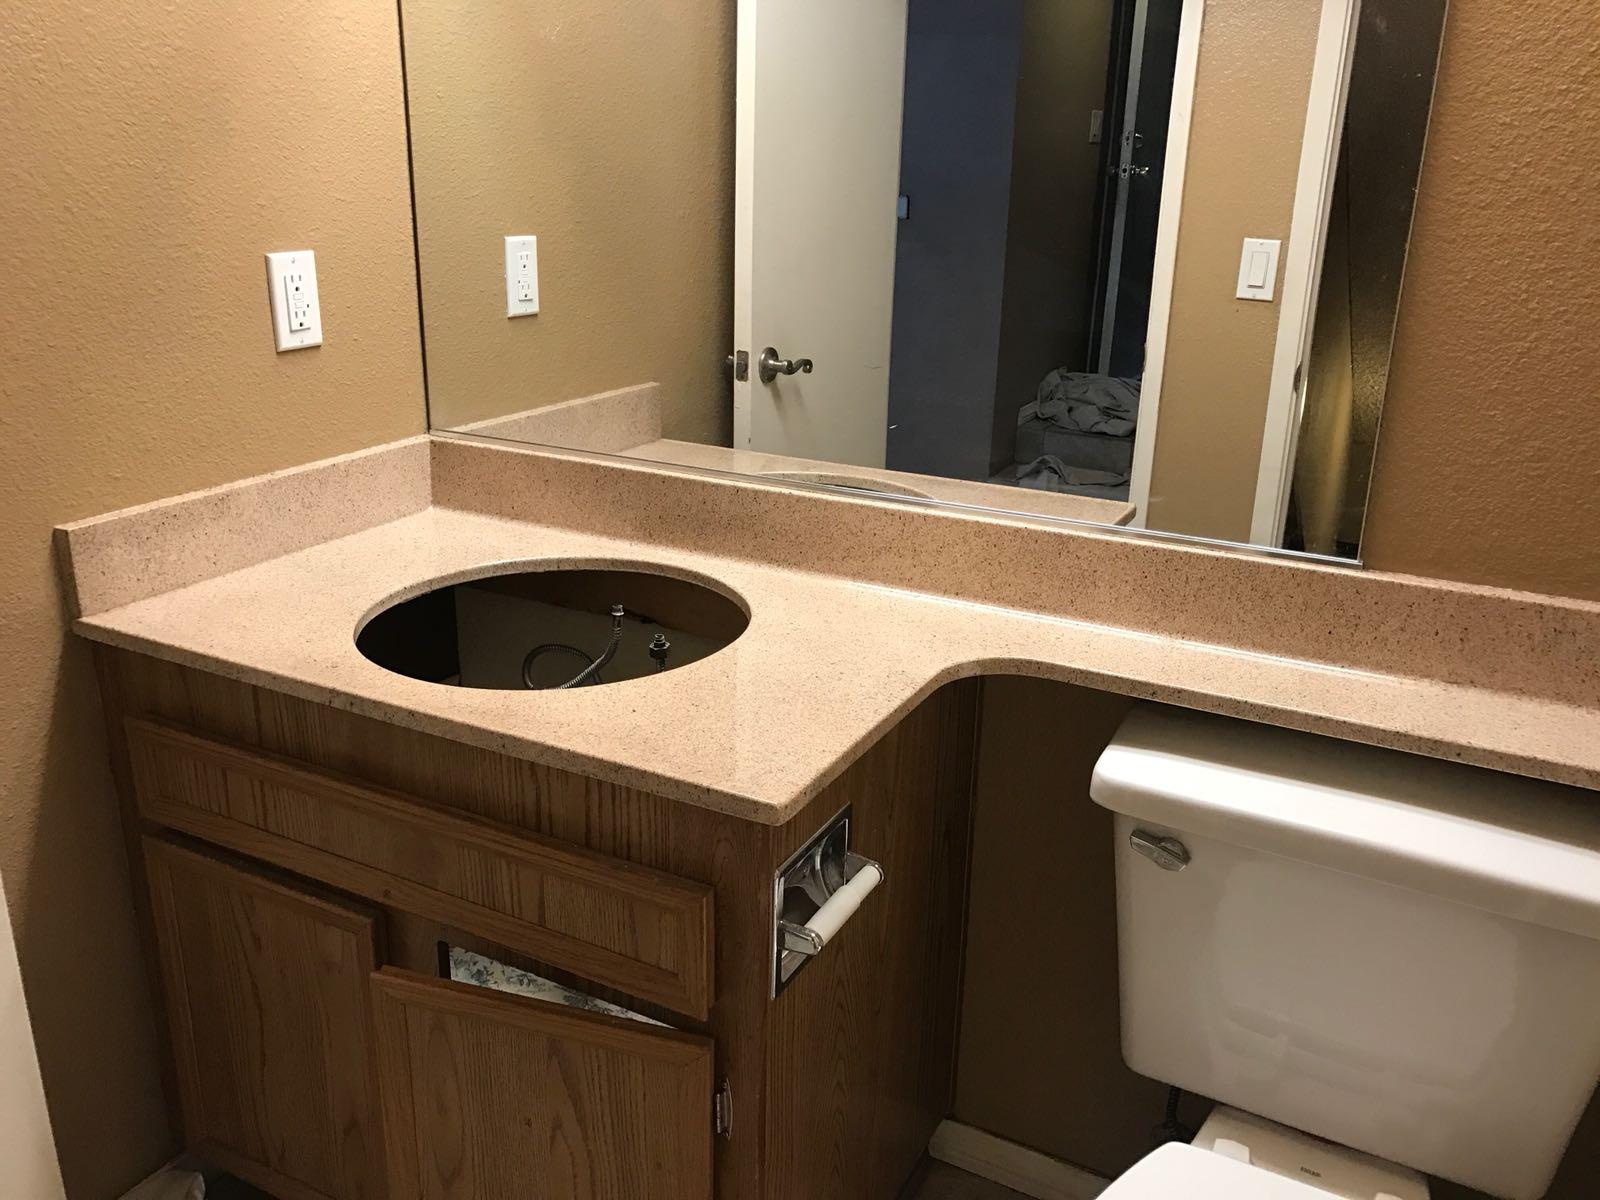 Bathroom Vanity Resurfacing After - NuFinishPro